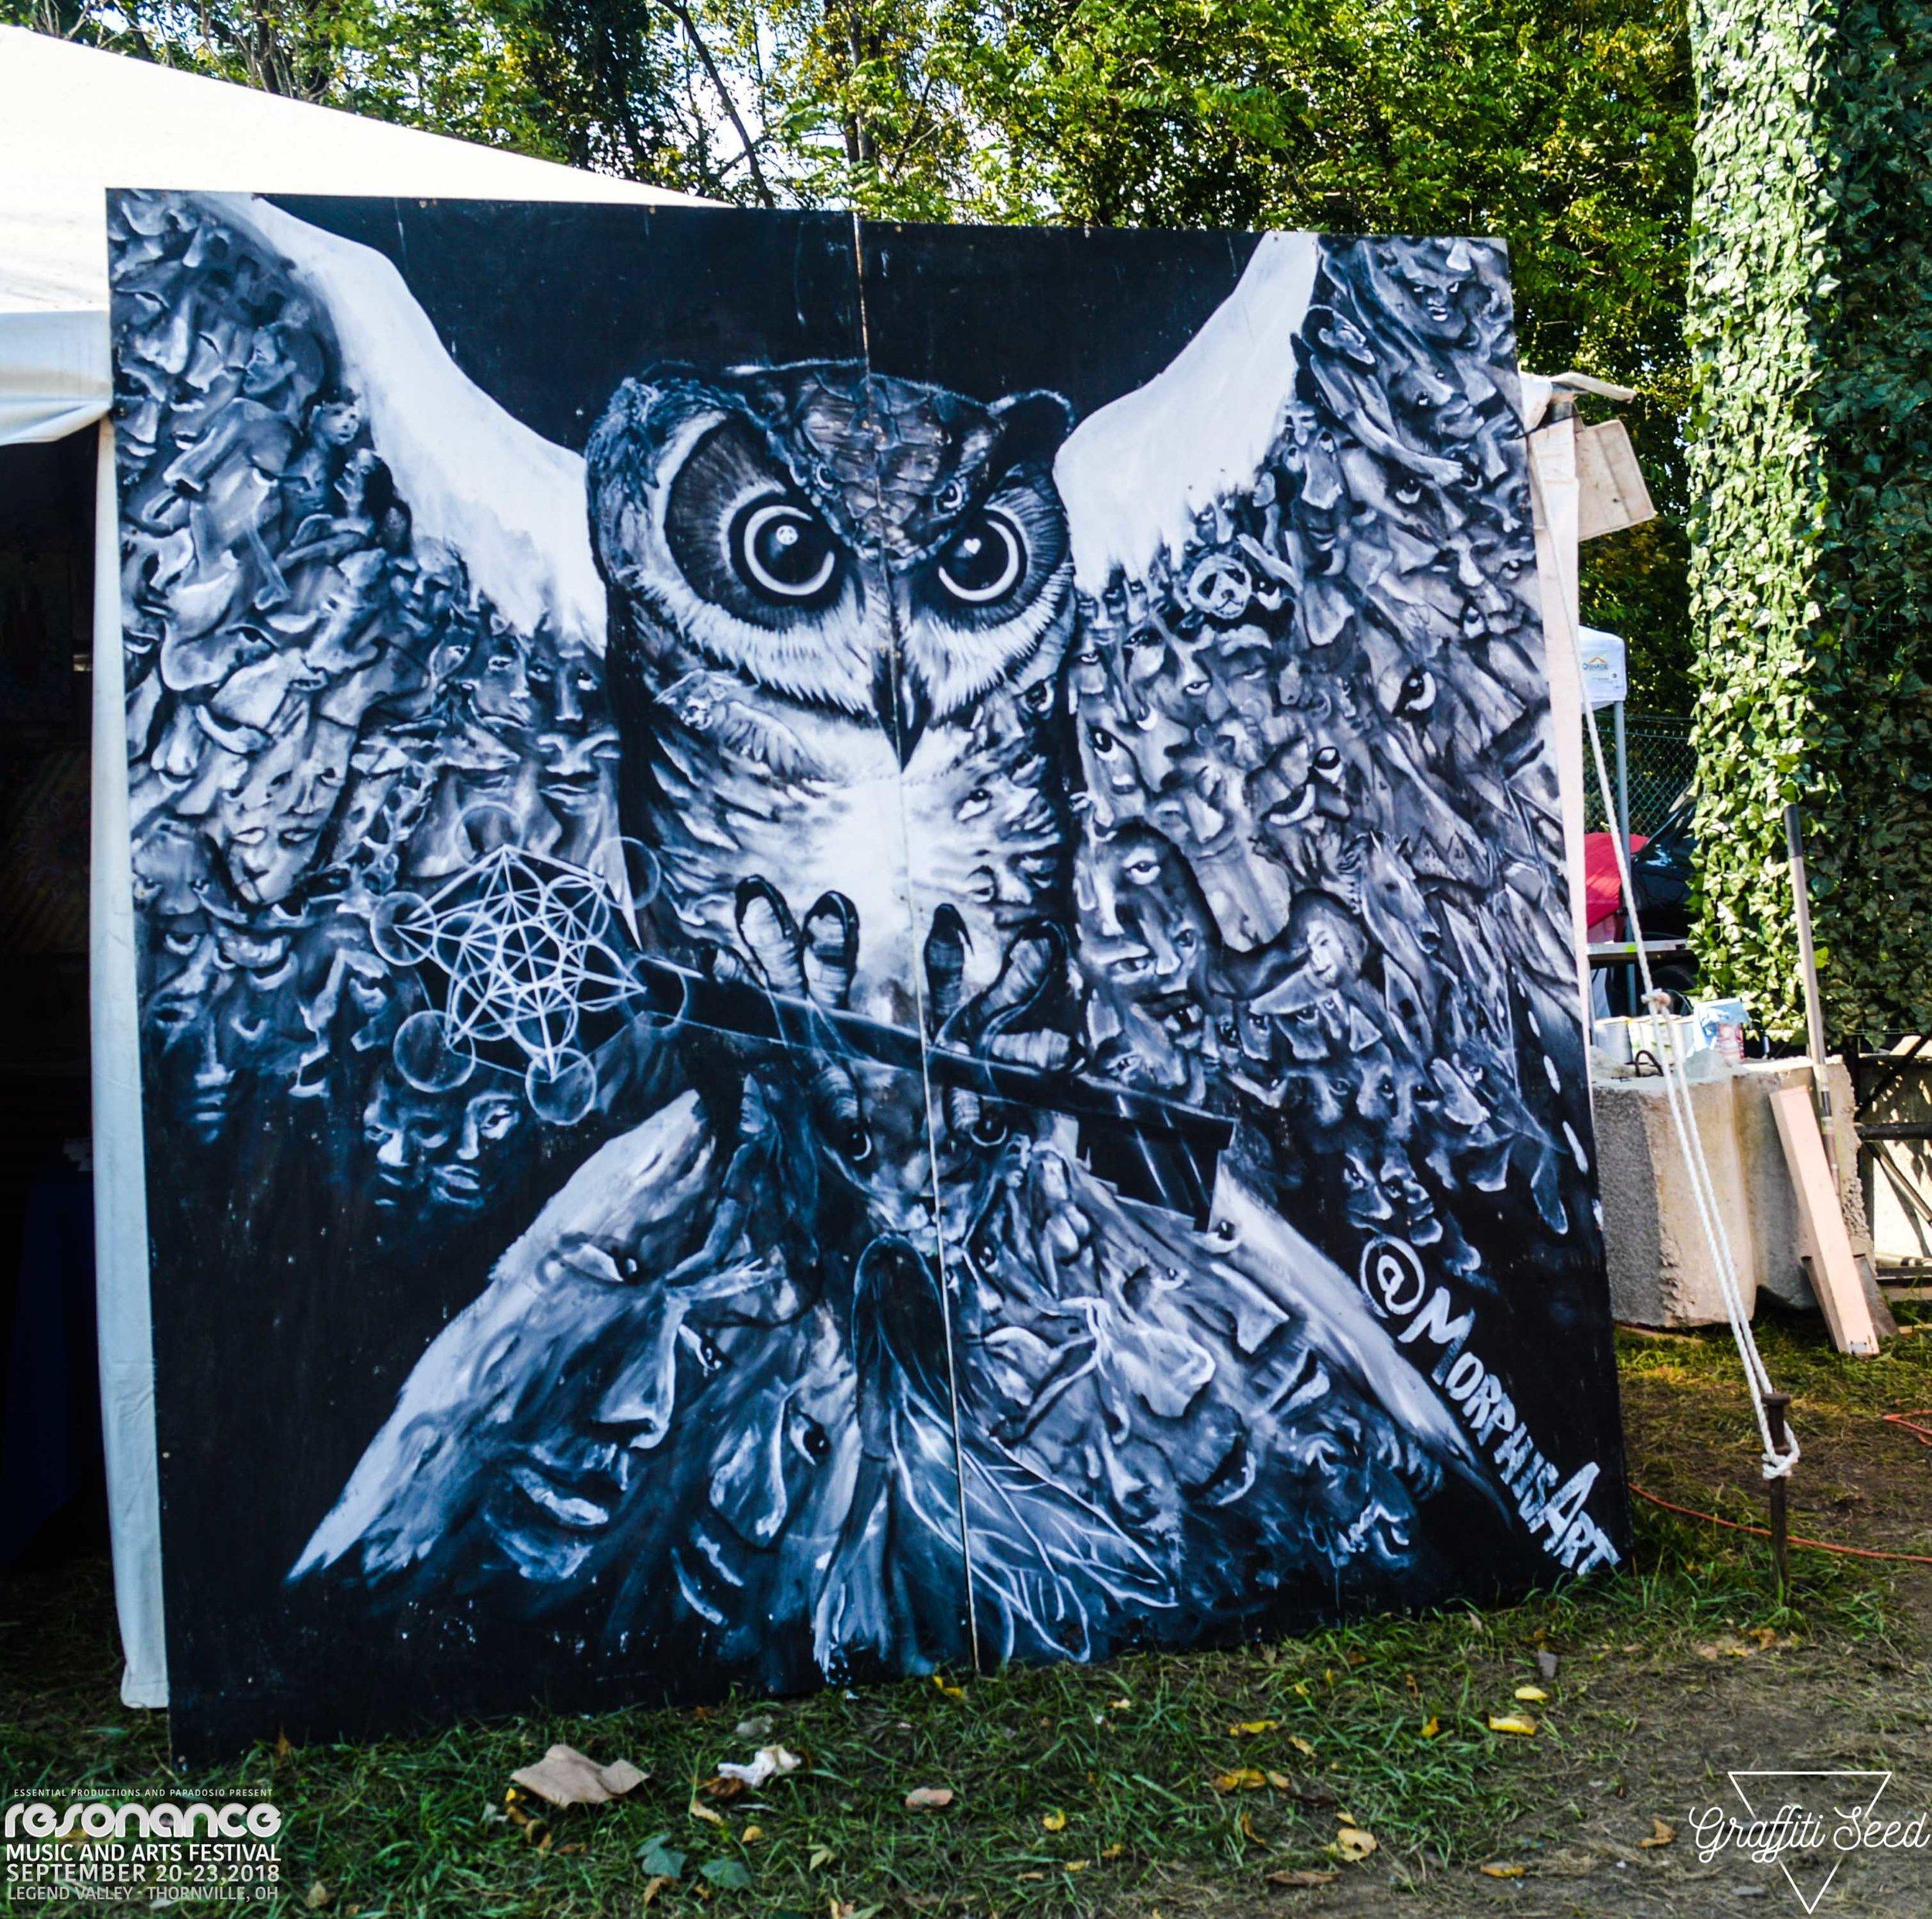 Resonance Music Festival 2018 _ www.GraffitiSeed.com 8.jpg